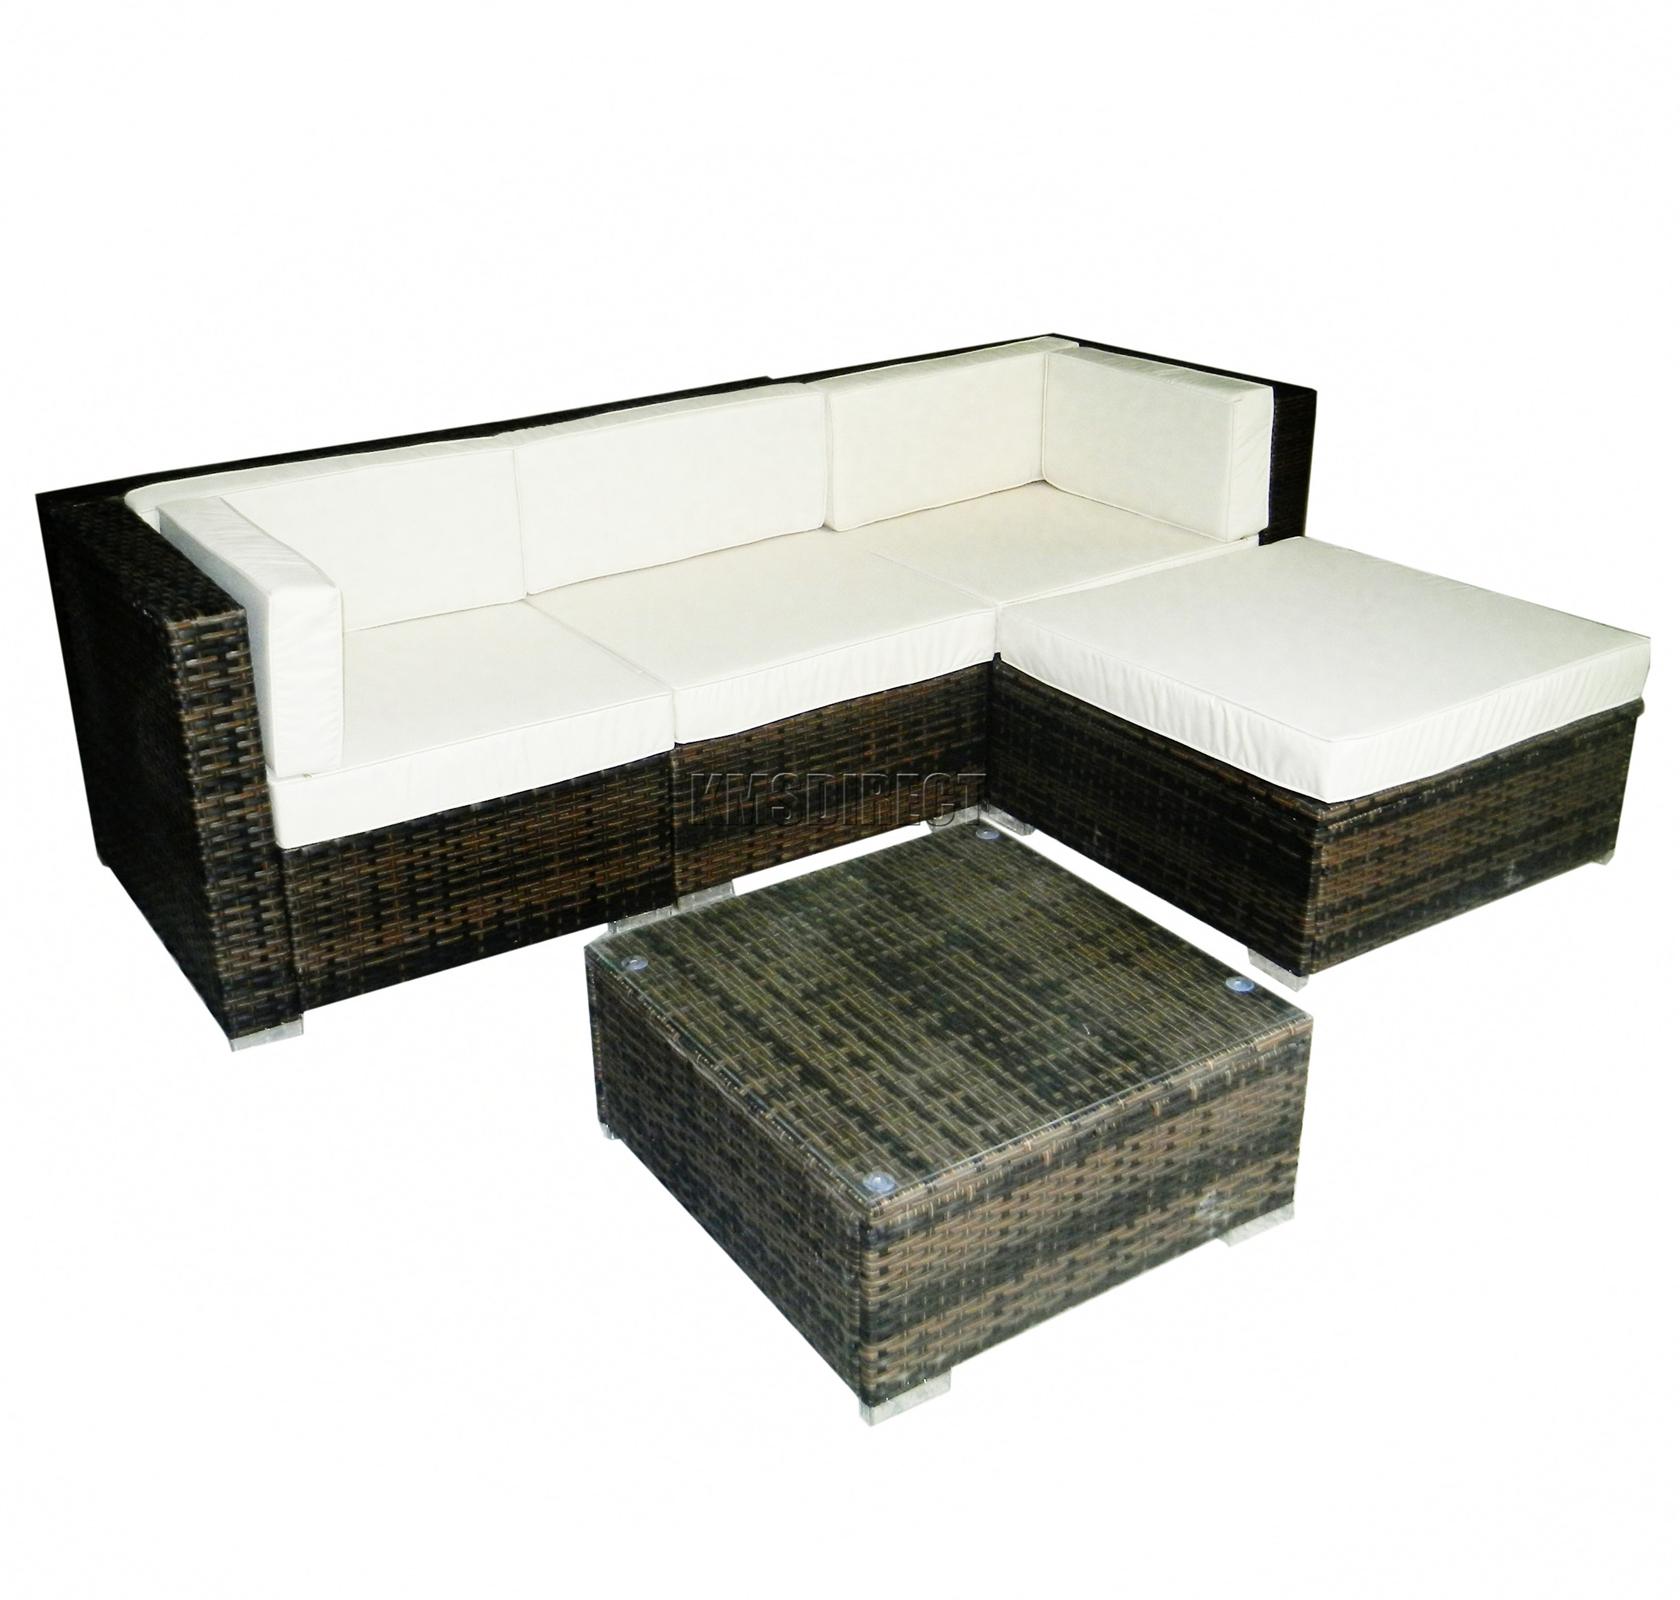 FoxHunter Rattan Furniture Set Table Garden Patio Outdoor Wicker Cube 11 Brow